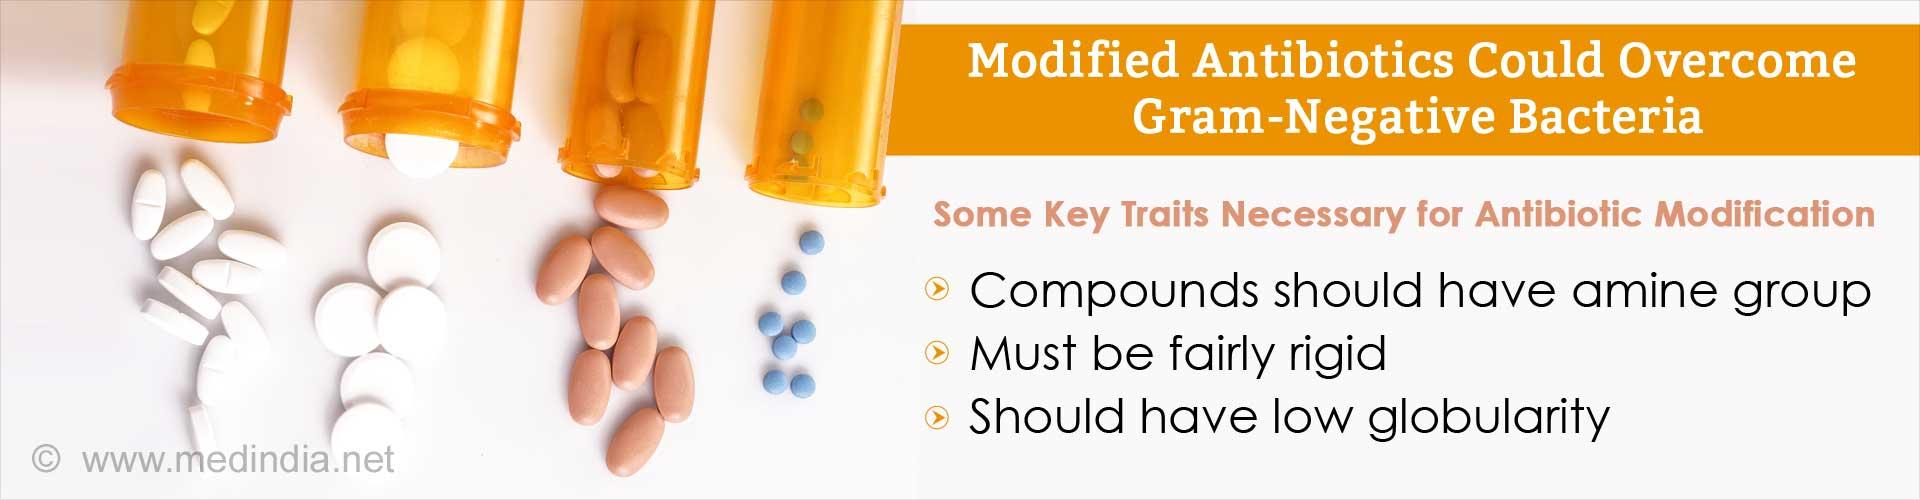 Modified Antibiotics to Combat Gram-Negative Bacterial Defenses